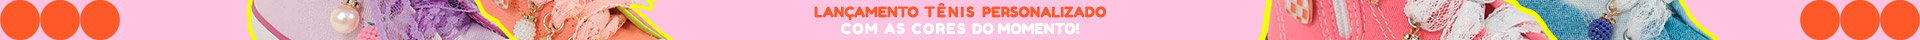 Banner tarja topo tênis